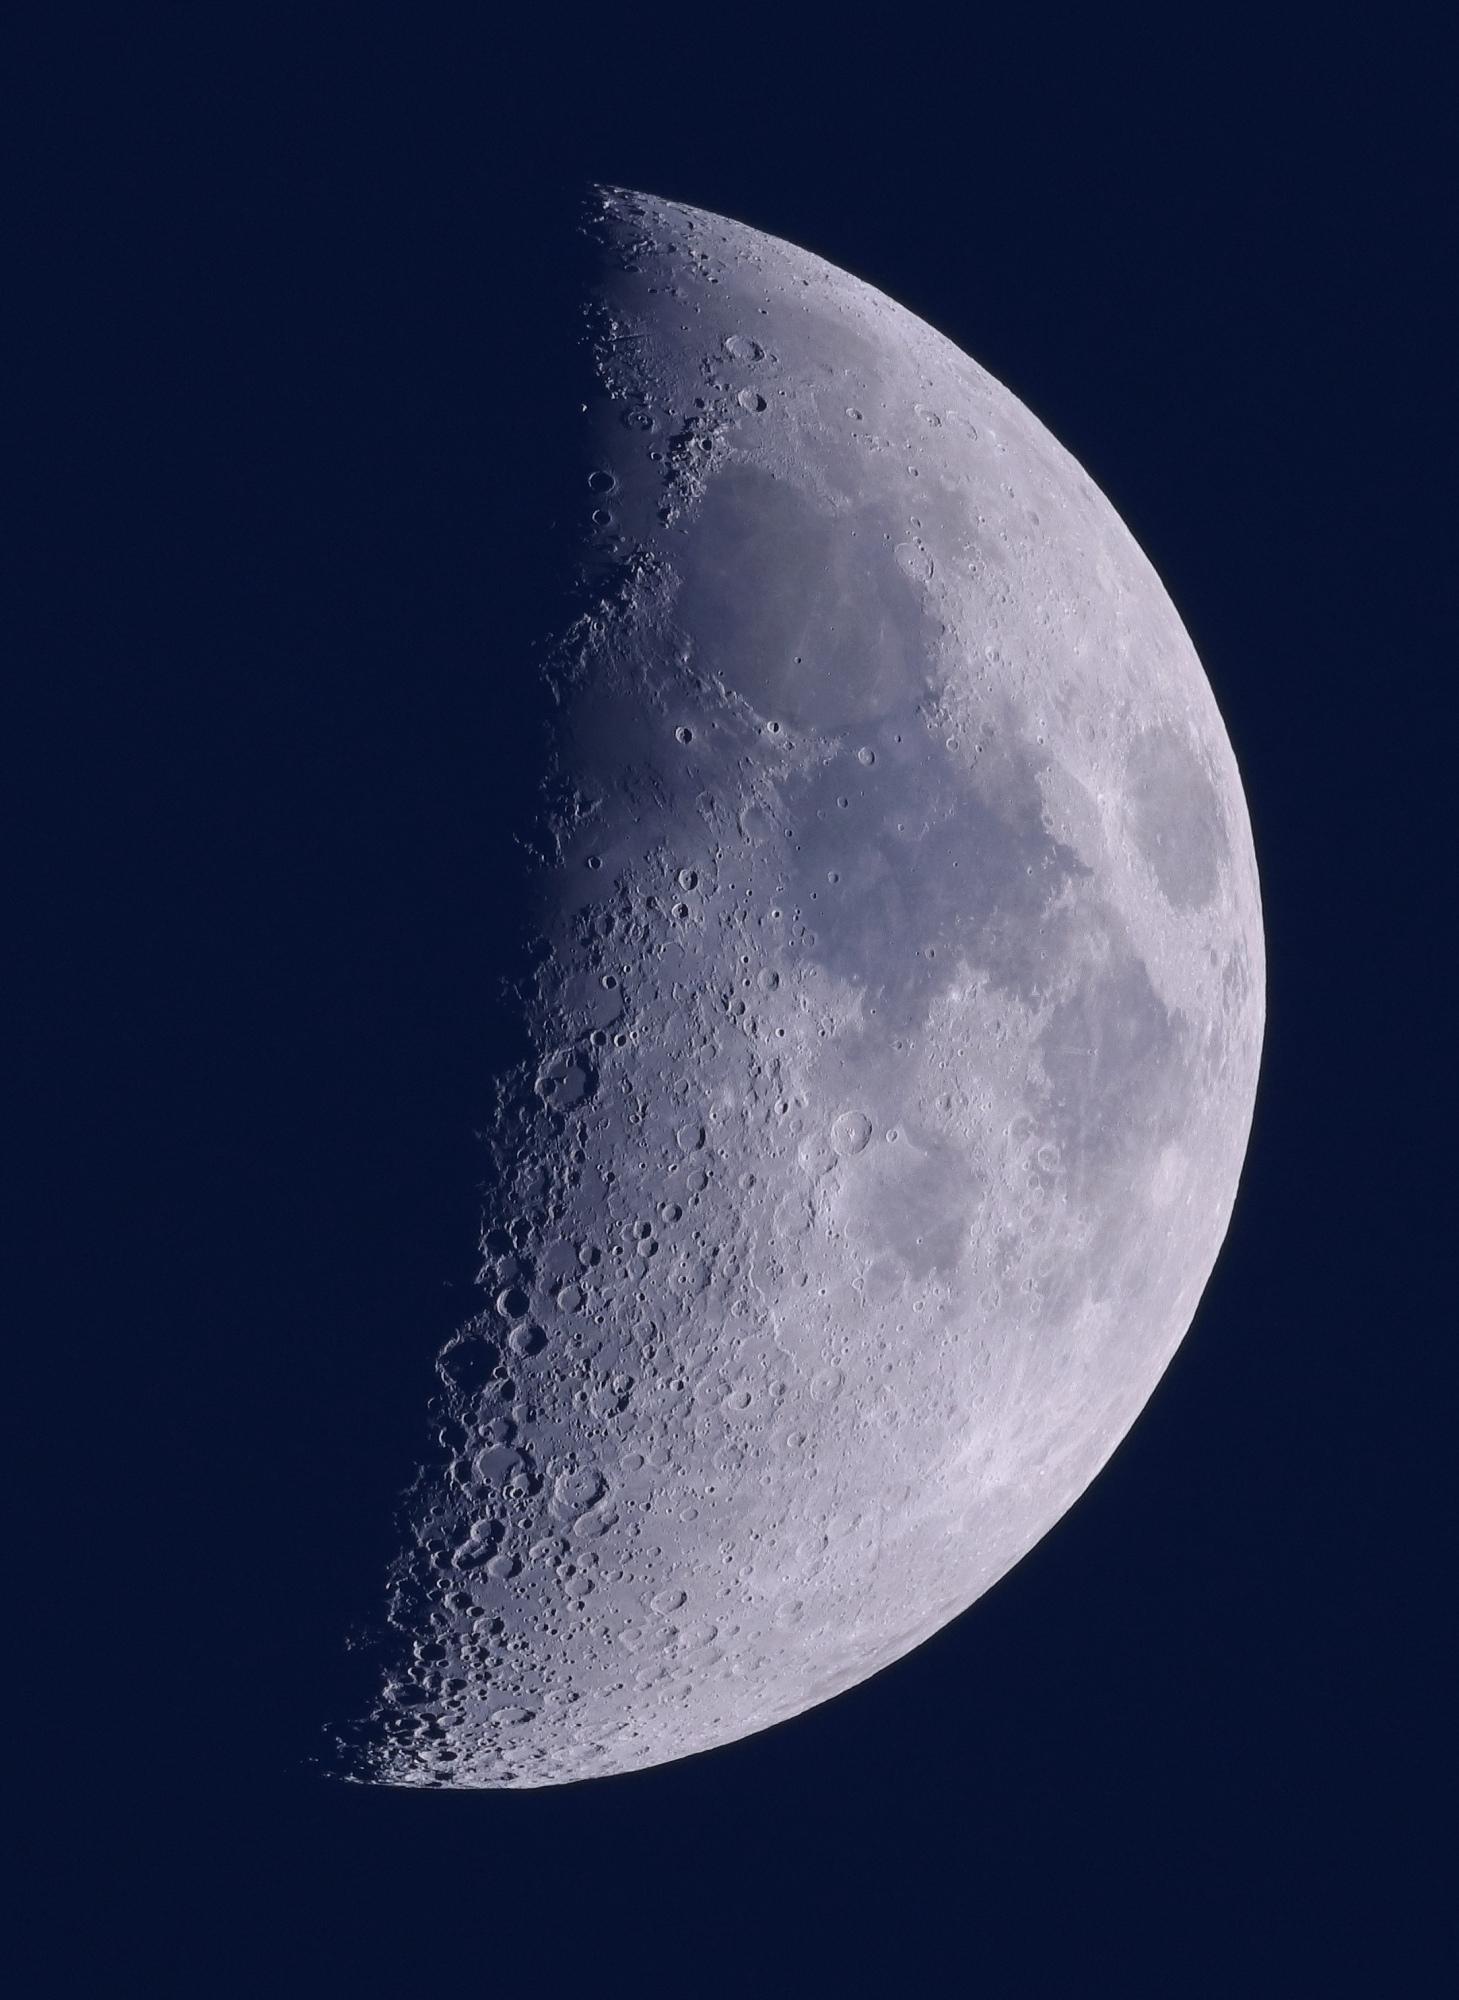 La Lune du 29 mai Sigma 150-600 mm.jpg